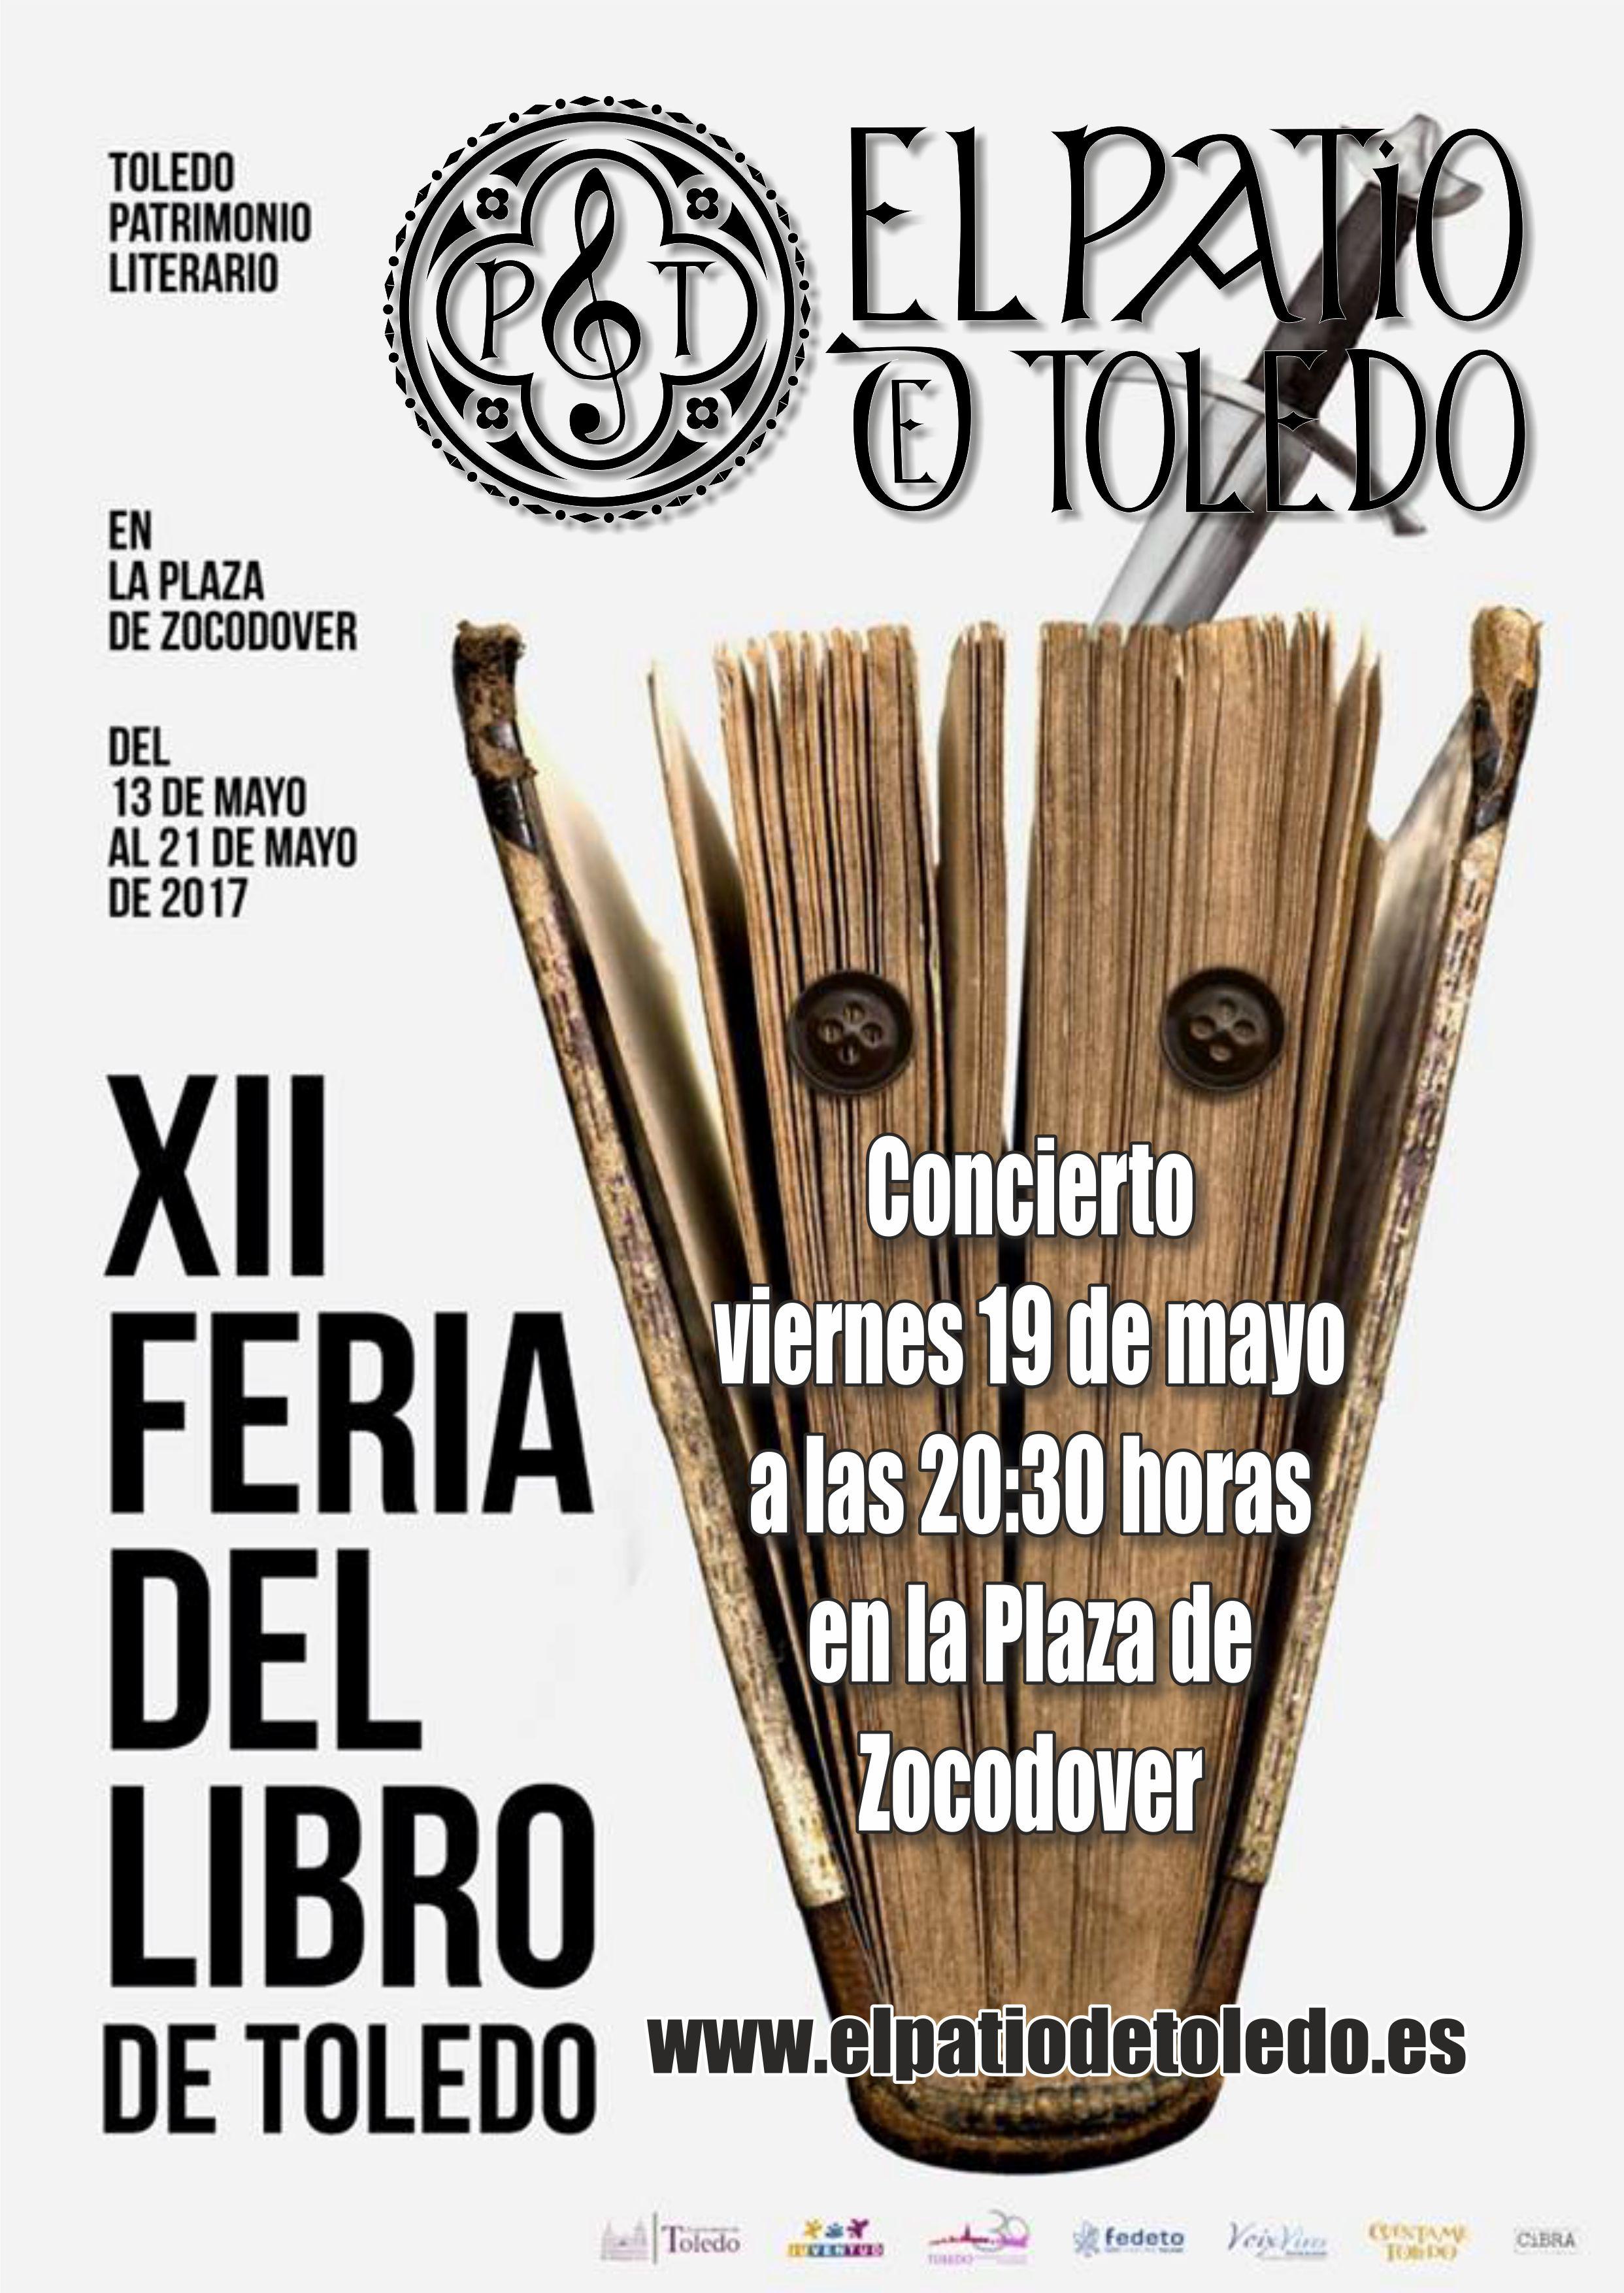 XII Feria del Libro de Toledo